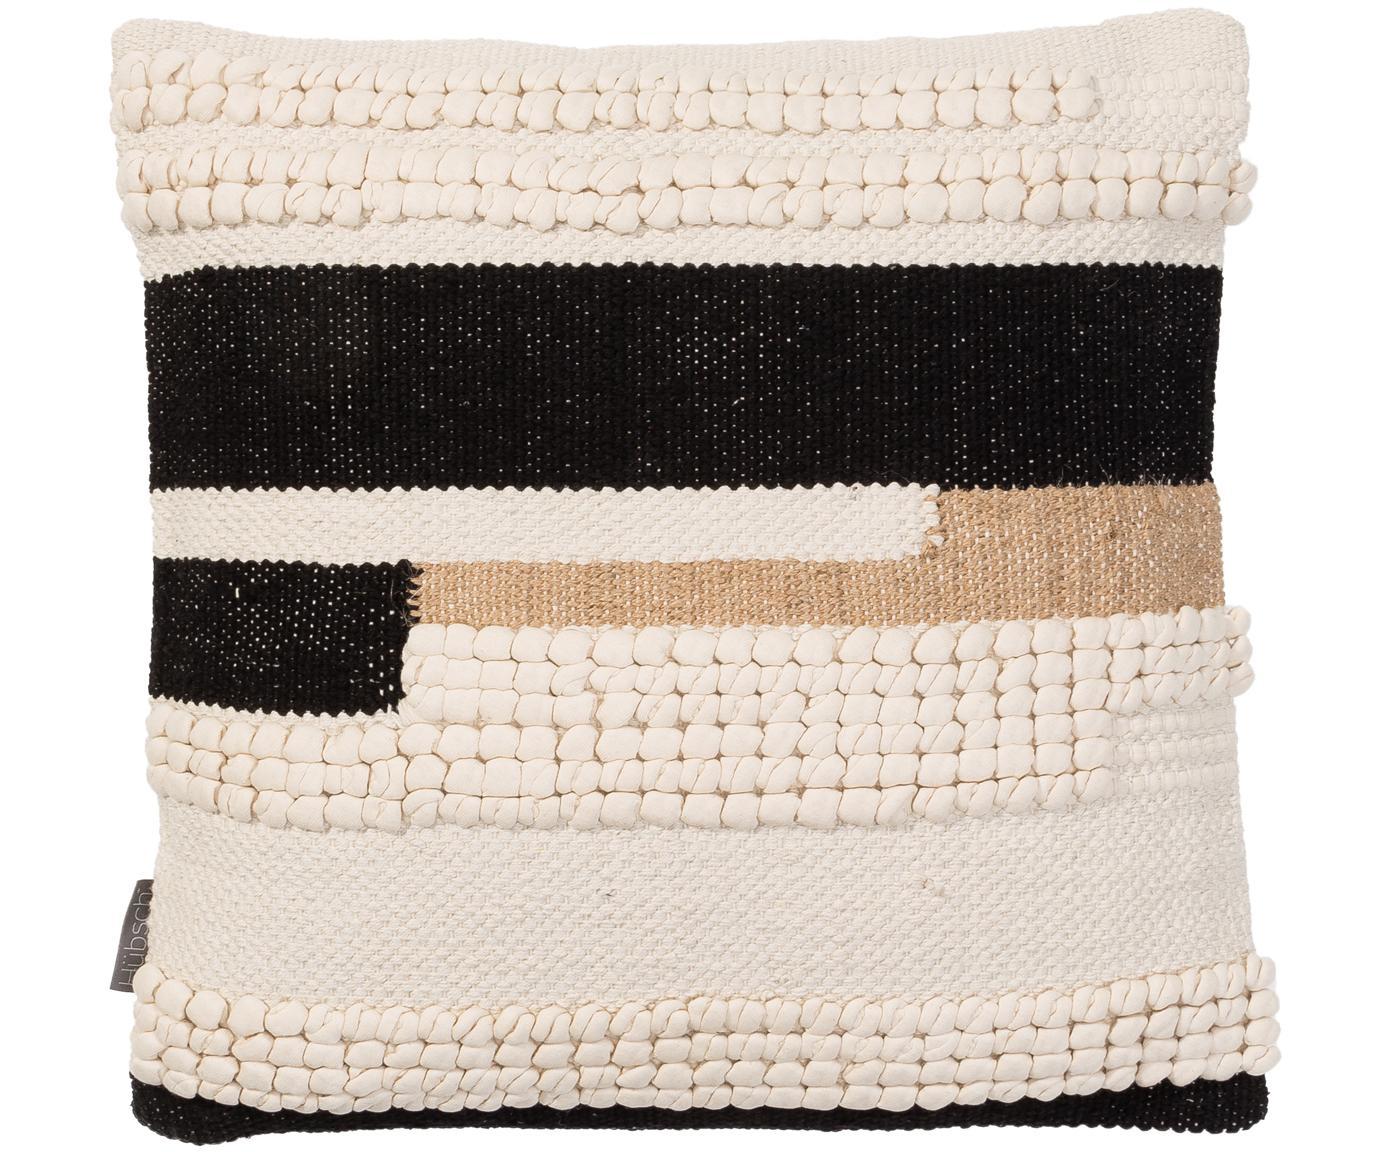 Funda de cojín Winti, 95%algodón, 5%poliéster, Crema, negro, beige, An 45 x L 45 cm